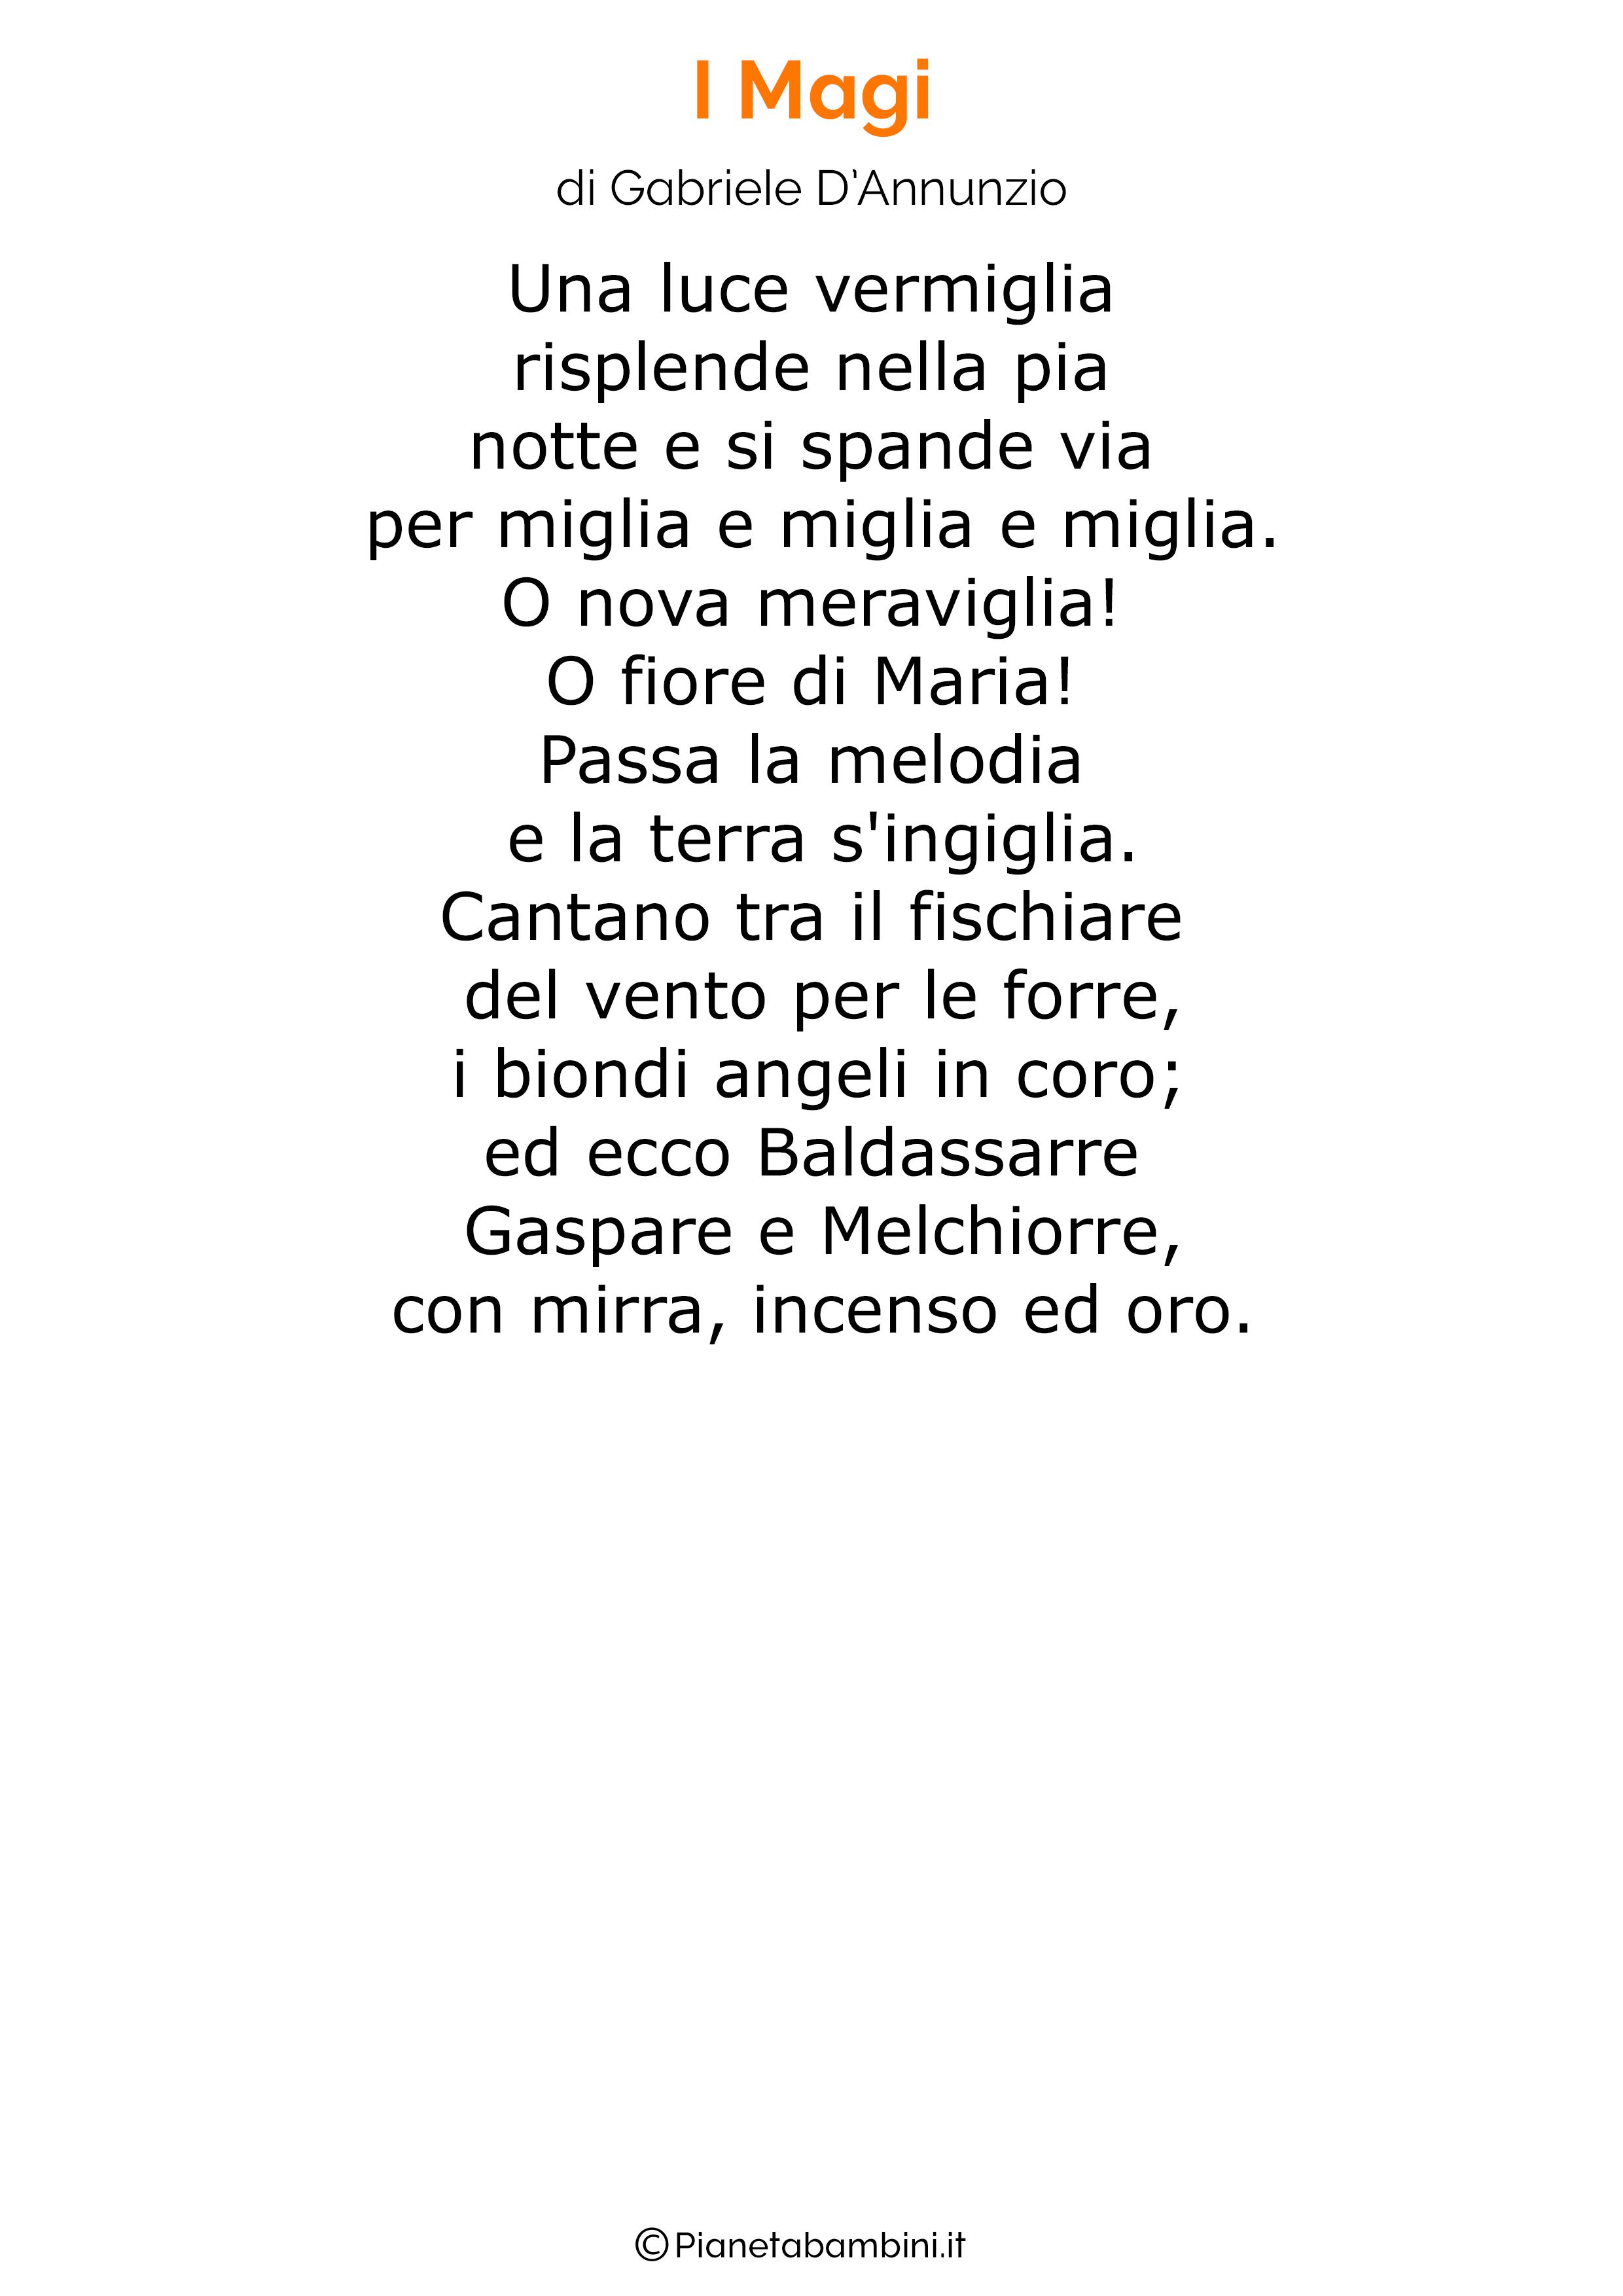 Poesia di Natale autori classici 03